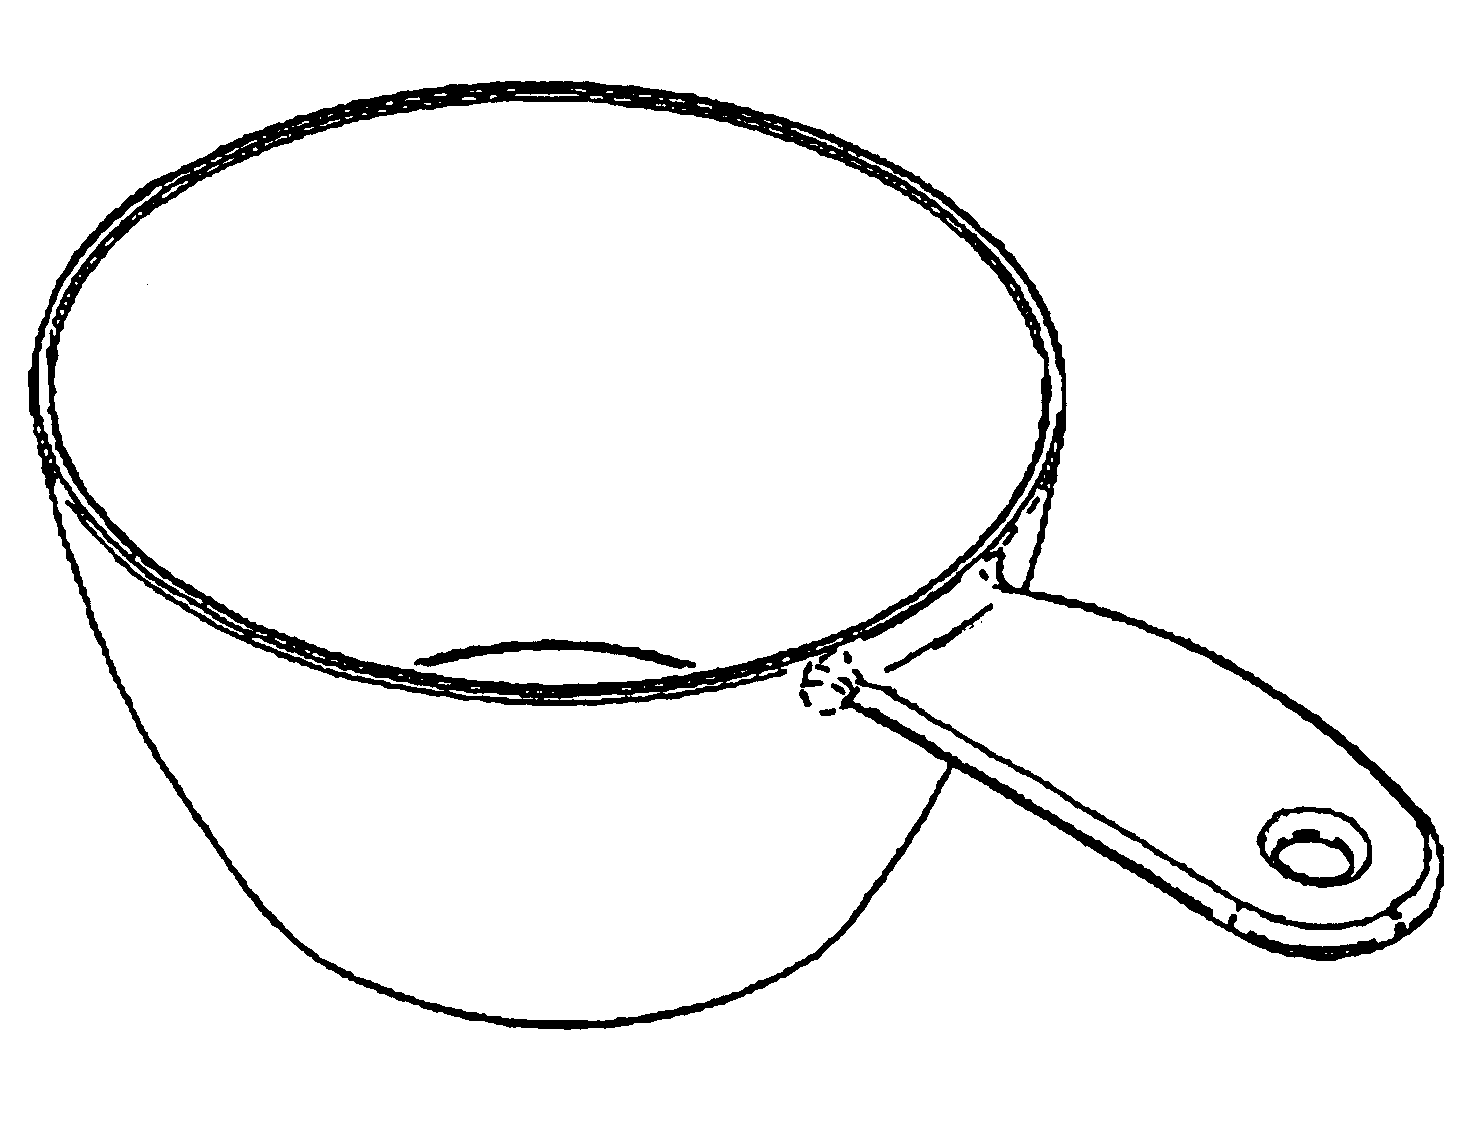 Measuring Cup Drawing At Getdrawings